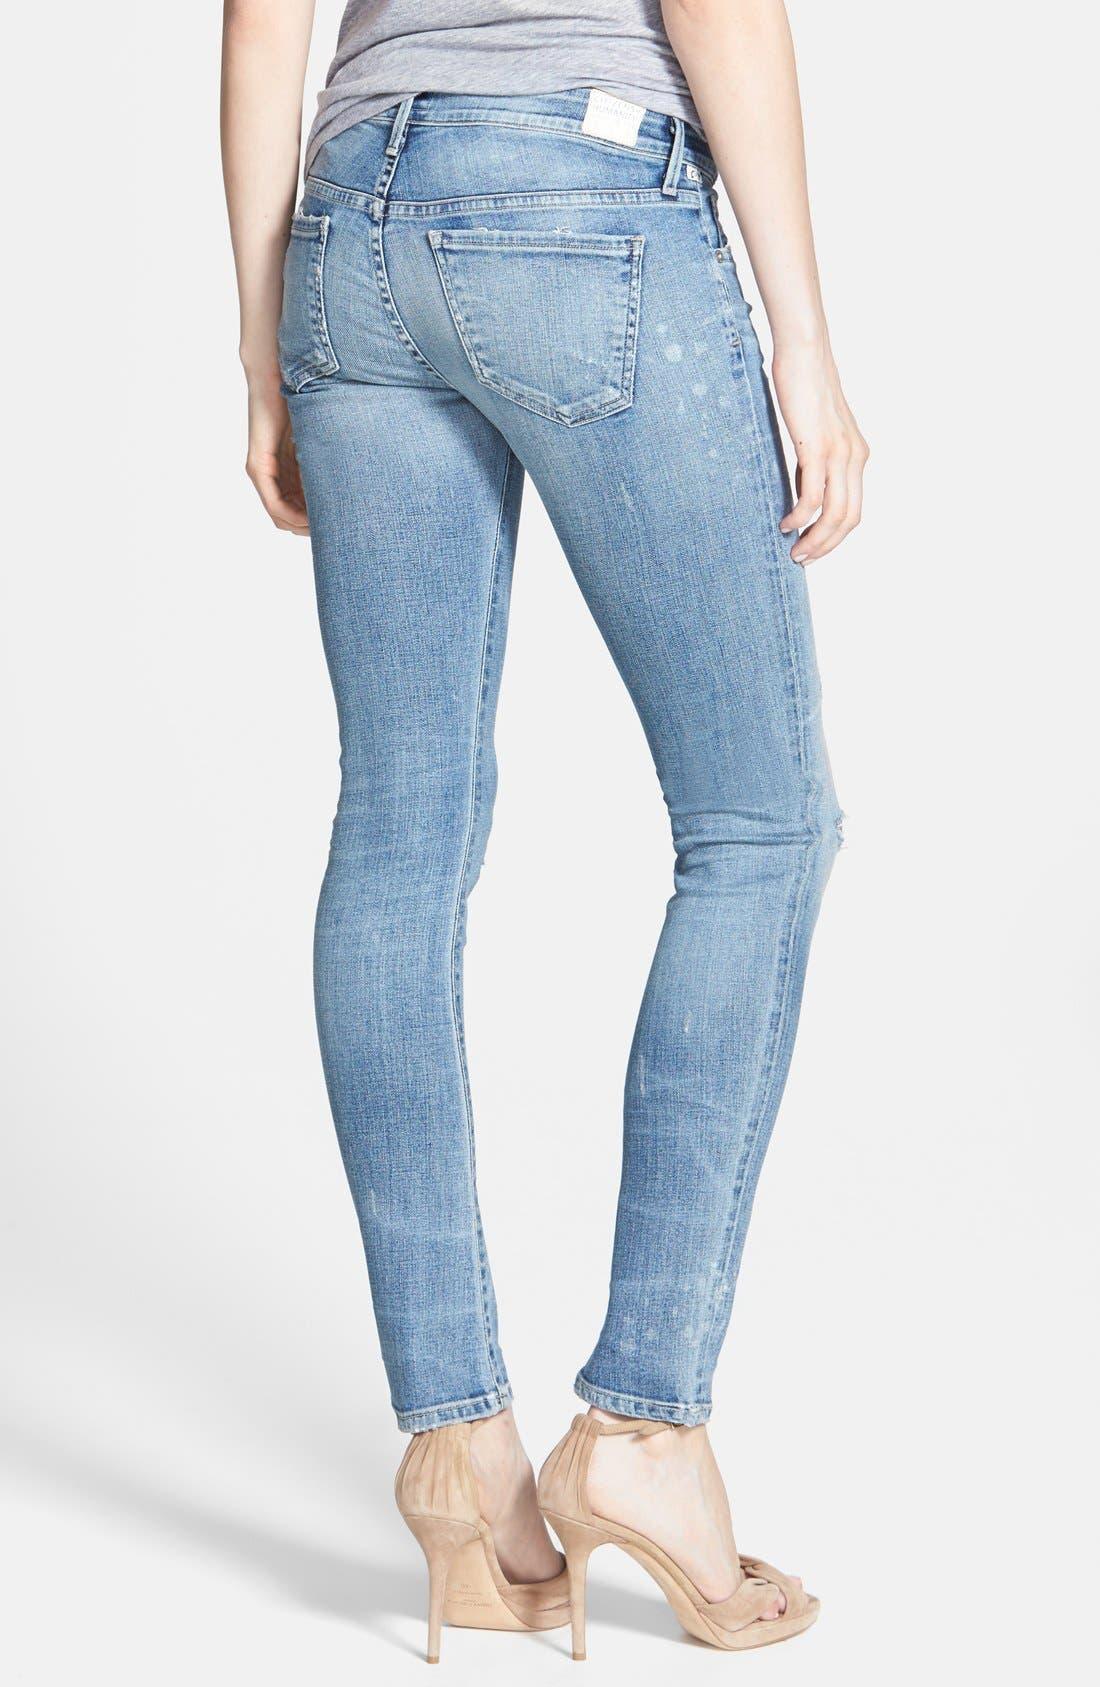 Alternate Image 2  - Citizens of Humanity 'Premium Vintage - Racer' Distressed Skinny Jeans (Crosby)